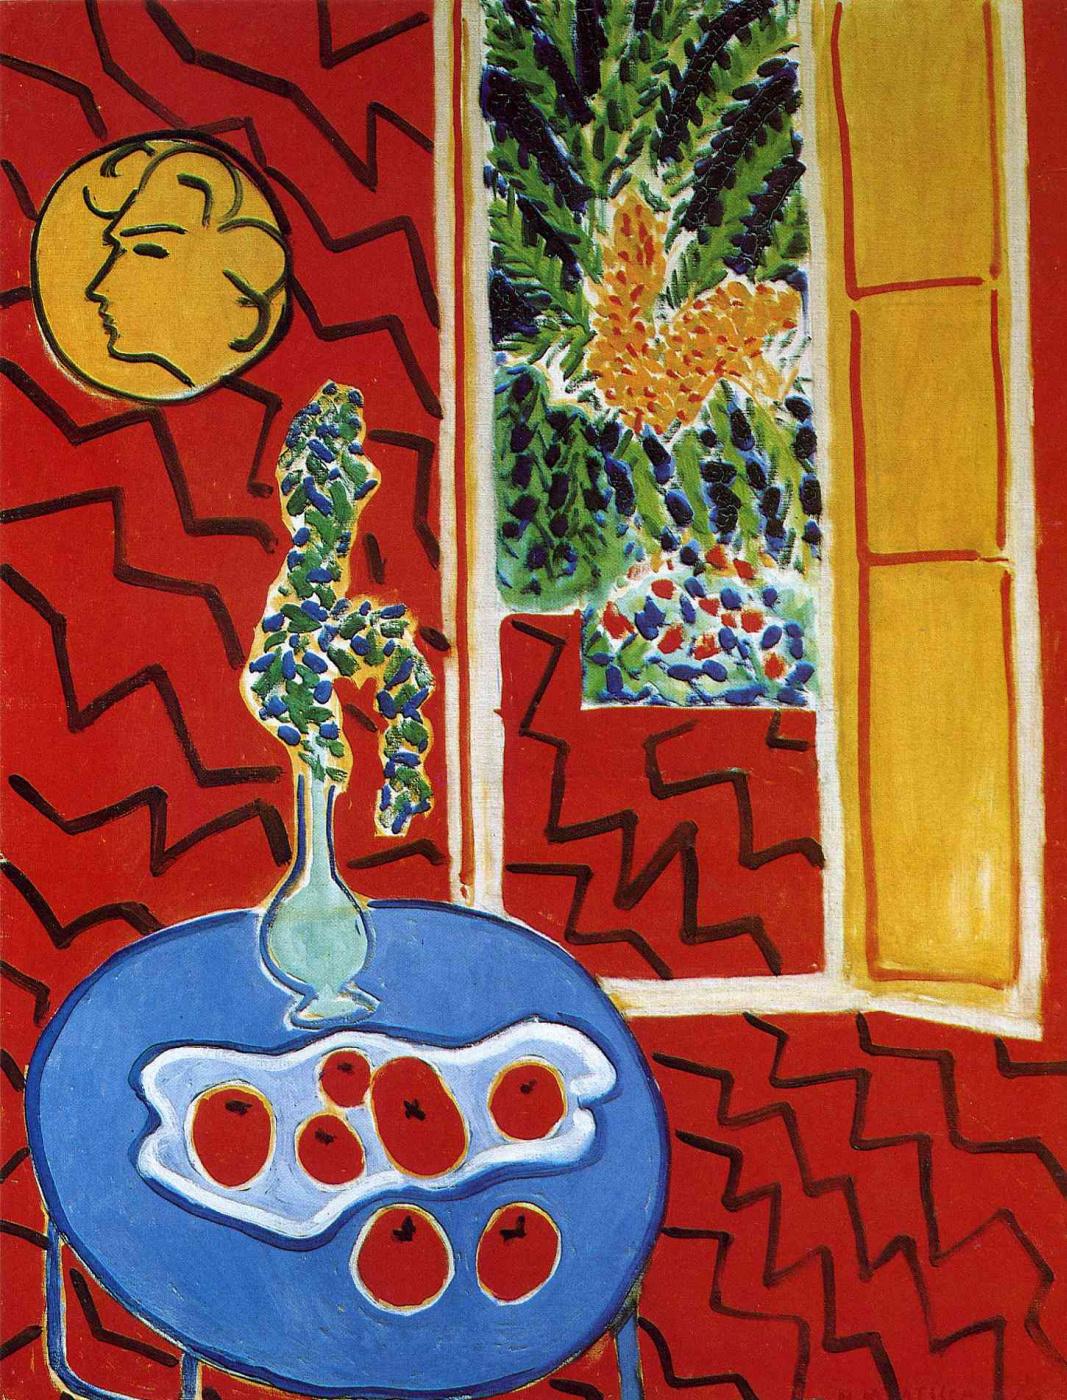 Henri Matisse. Red interior. Still life on a blue table